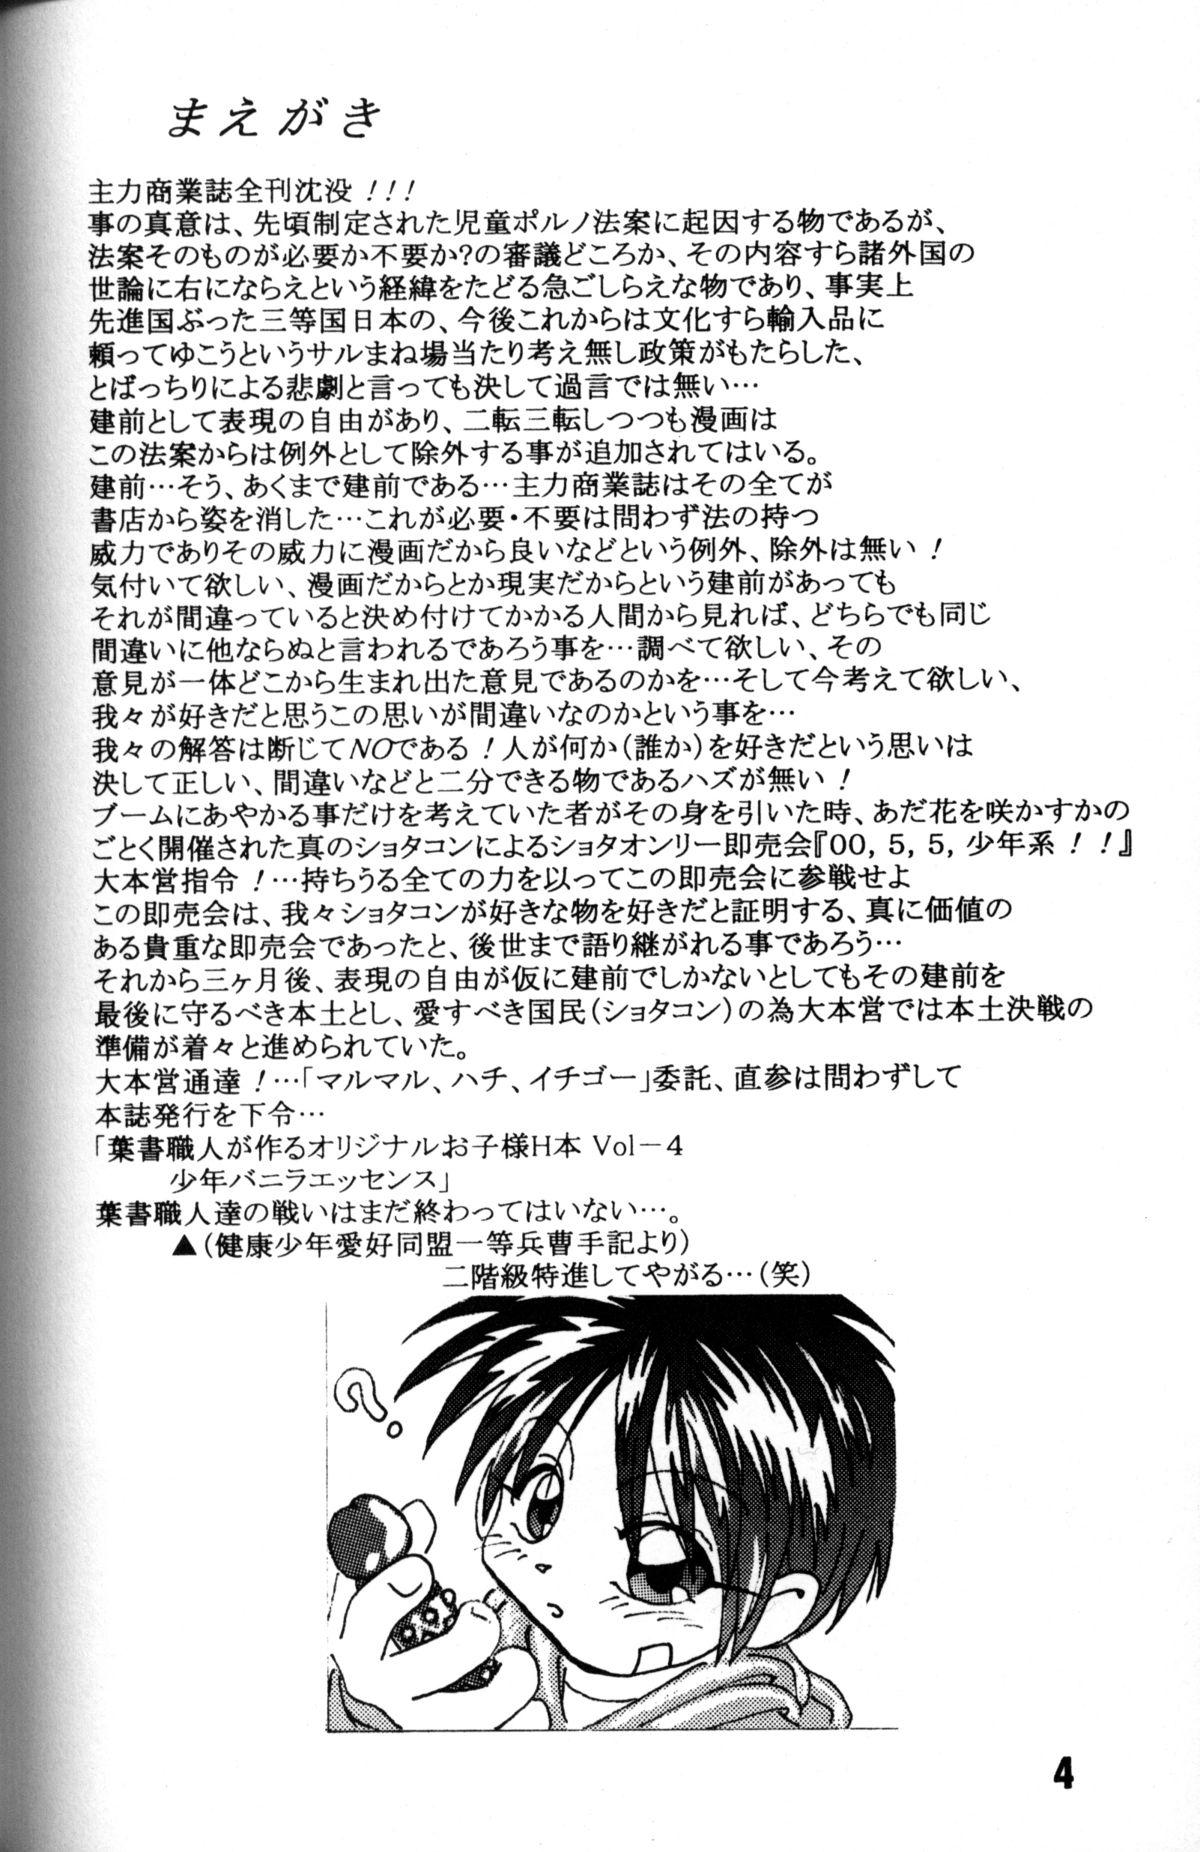 Anthology - Nekketsu Project - Volume 4 'Shounen Vanilla Essence' 2